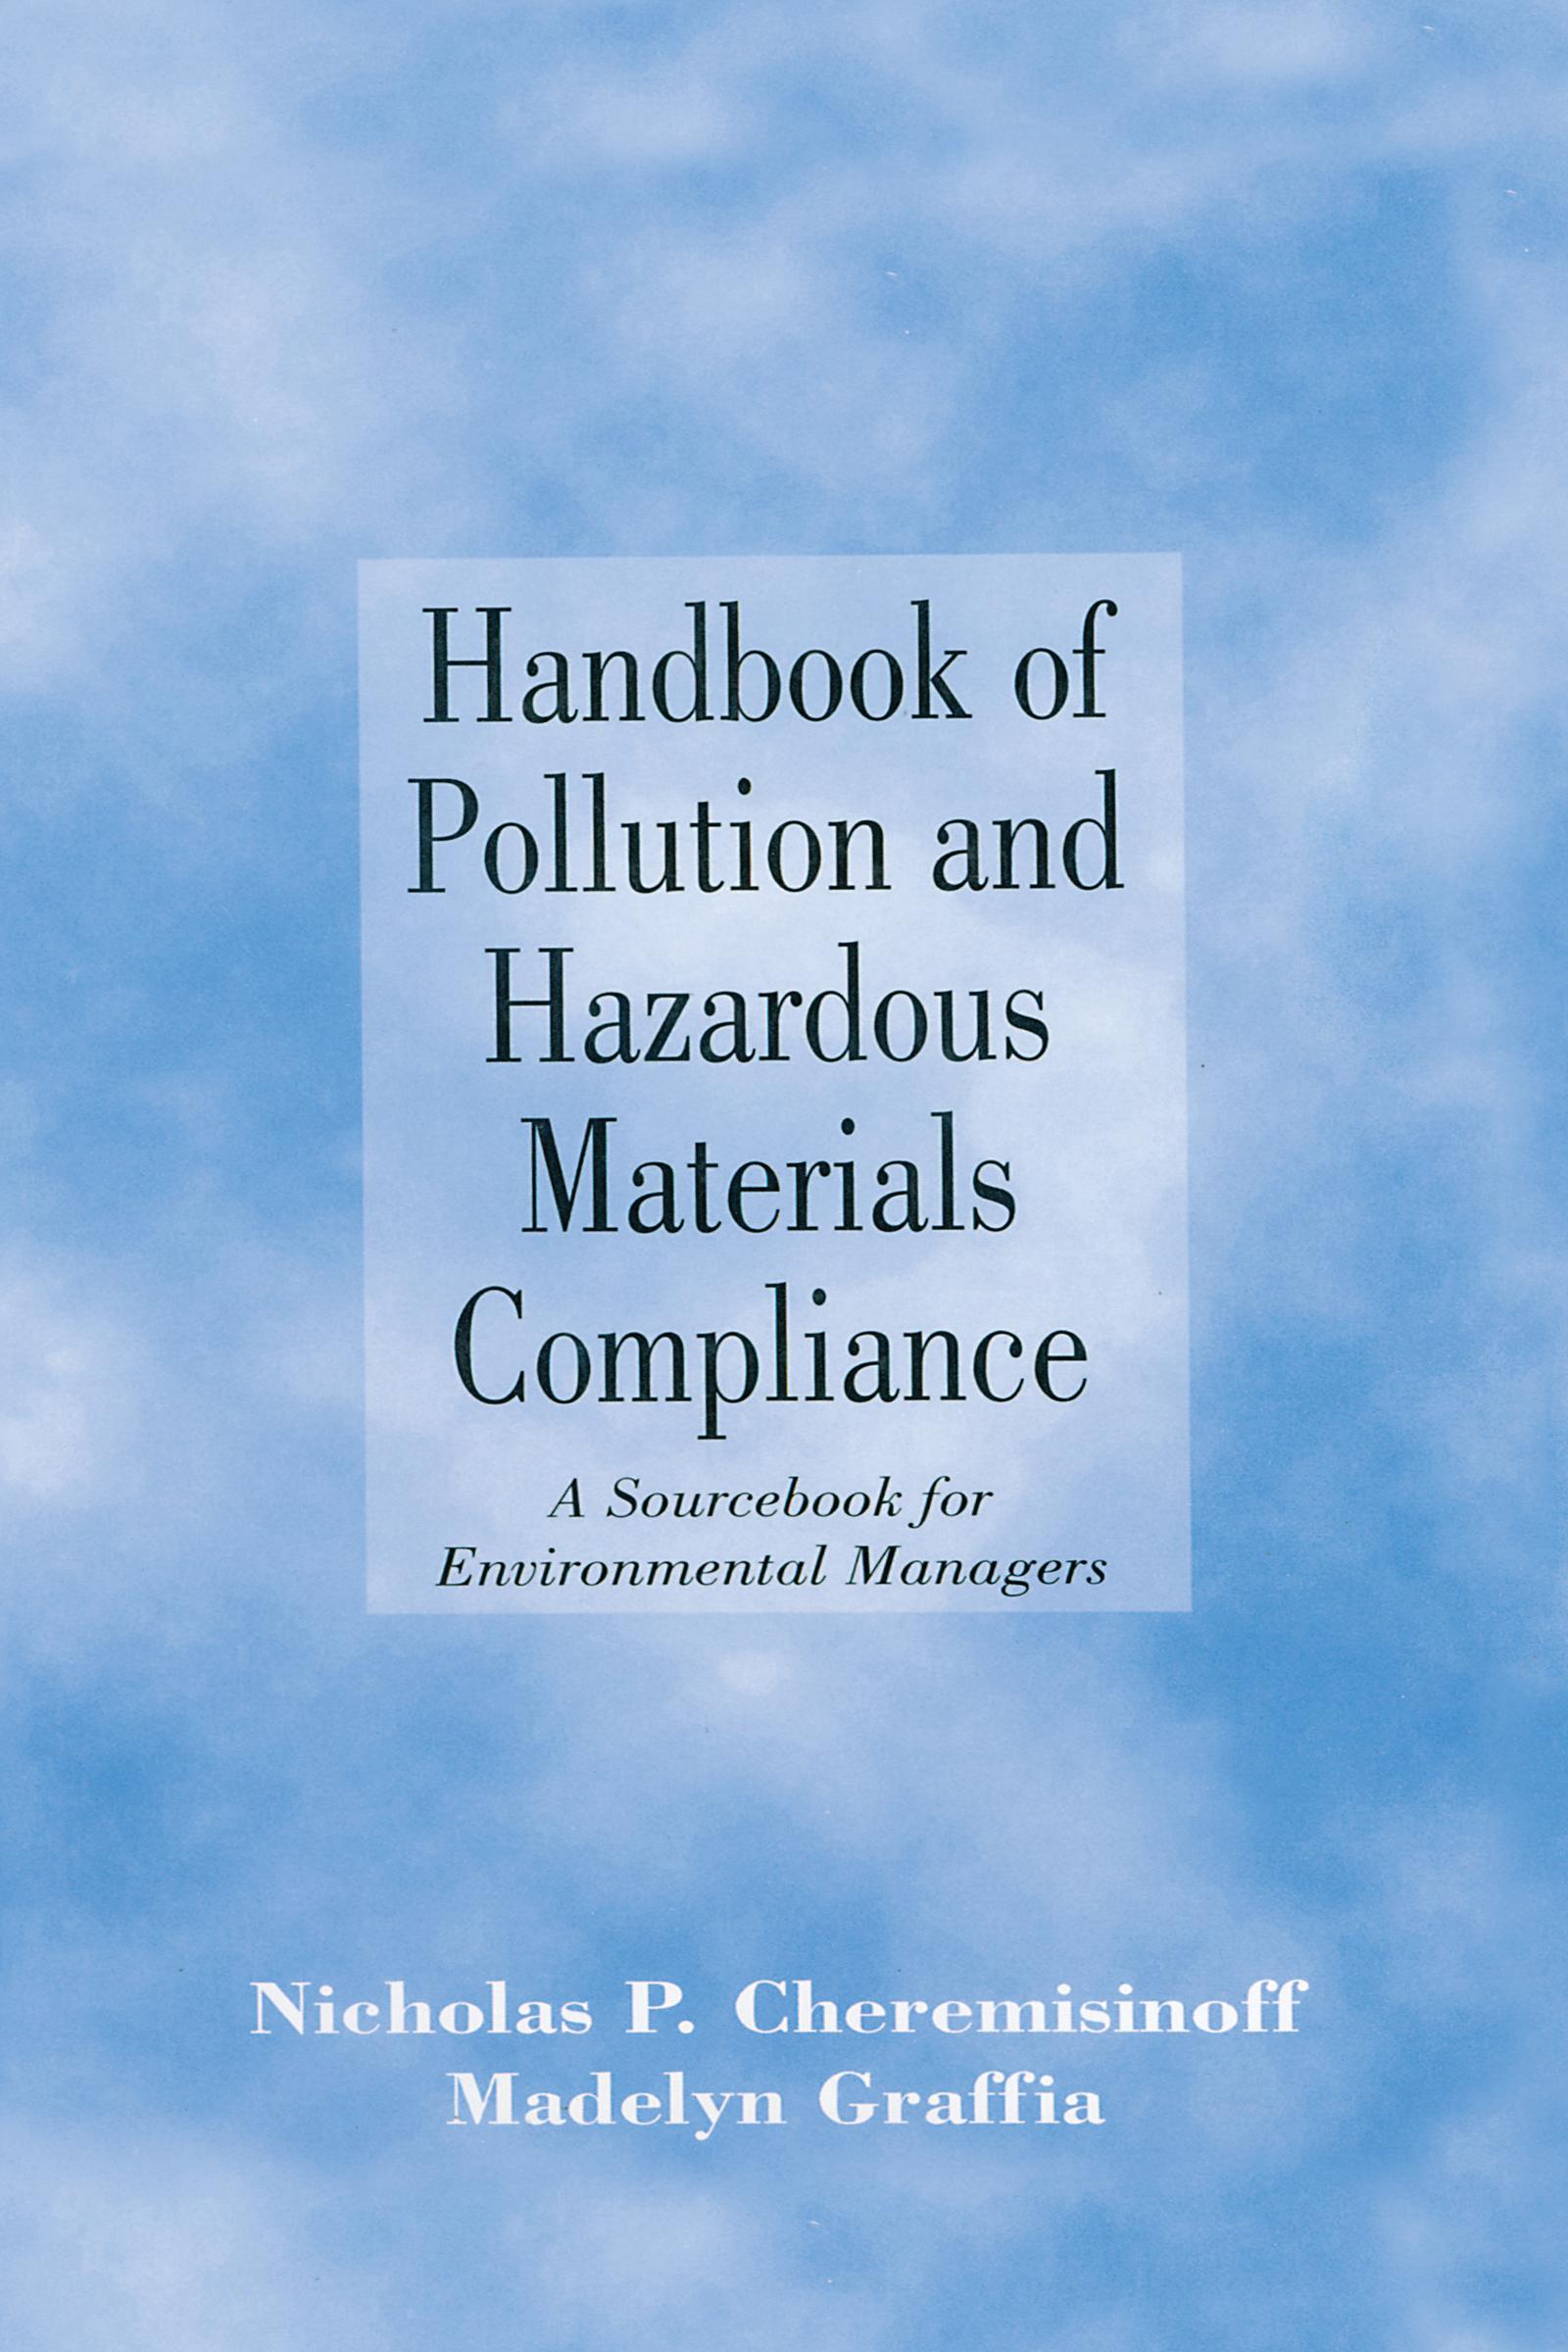 Handbook of Pollution and Hazardous Materials Compliance